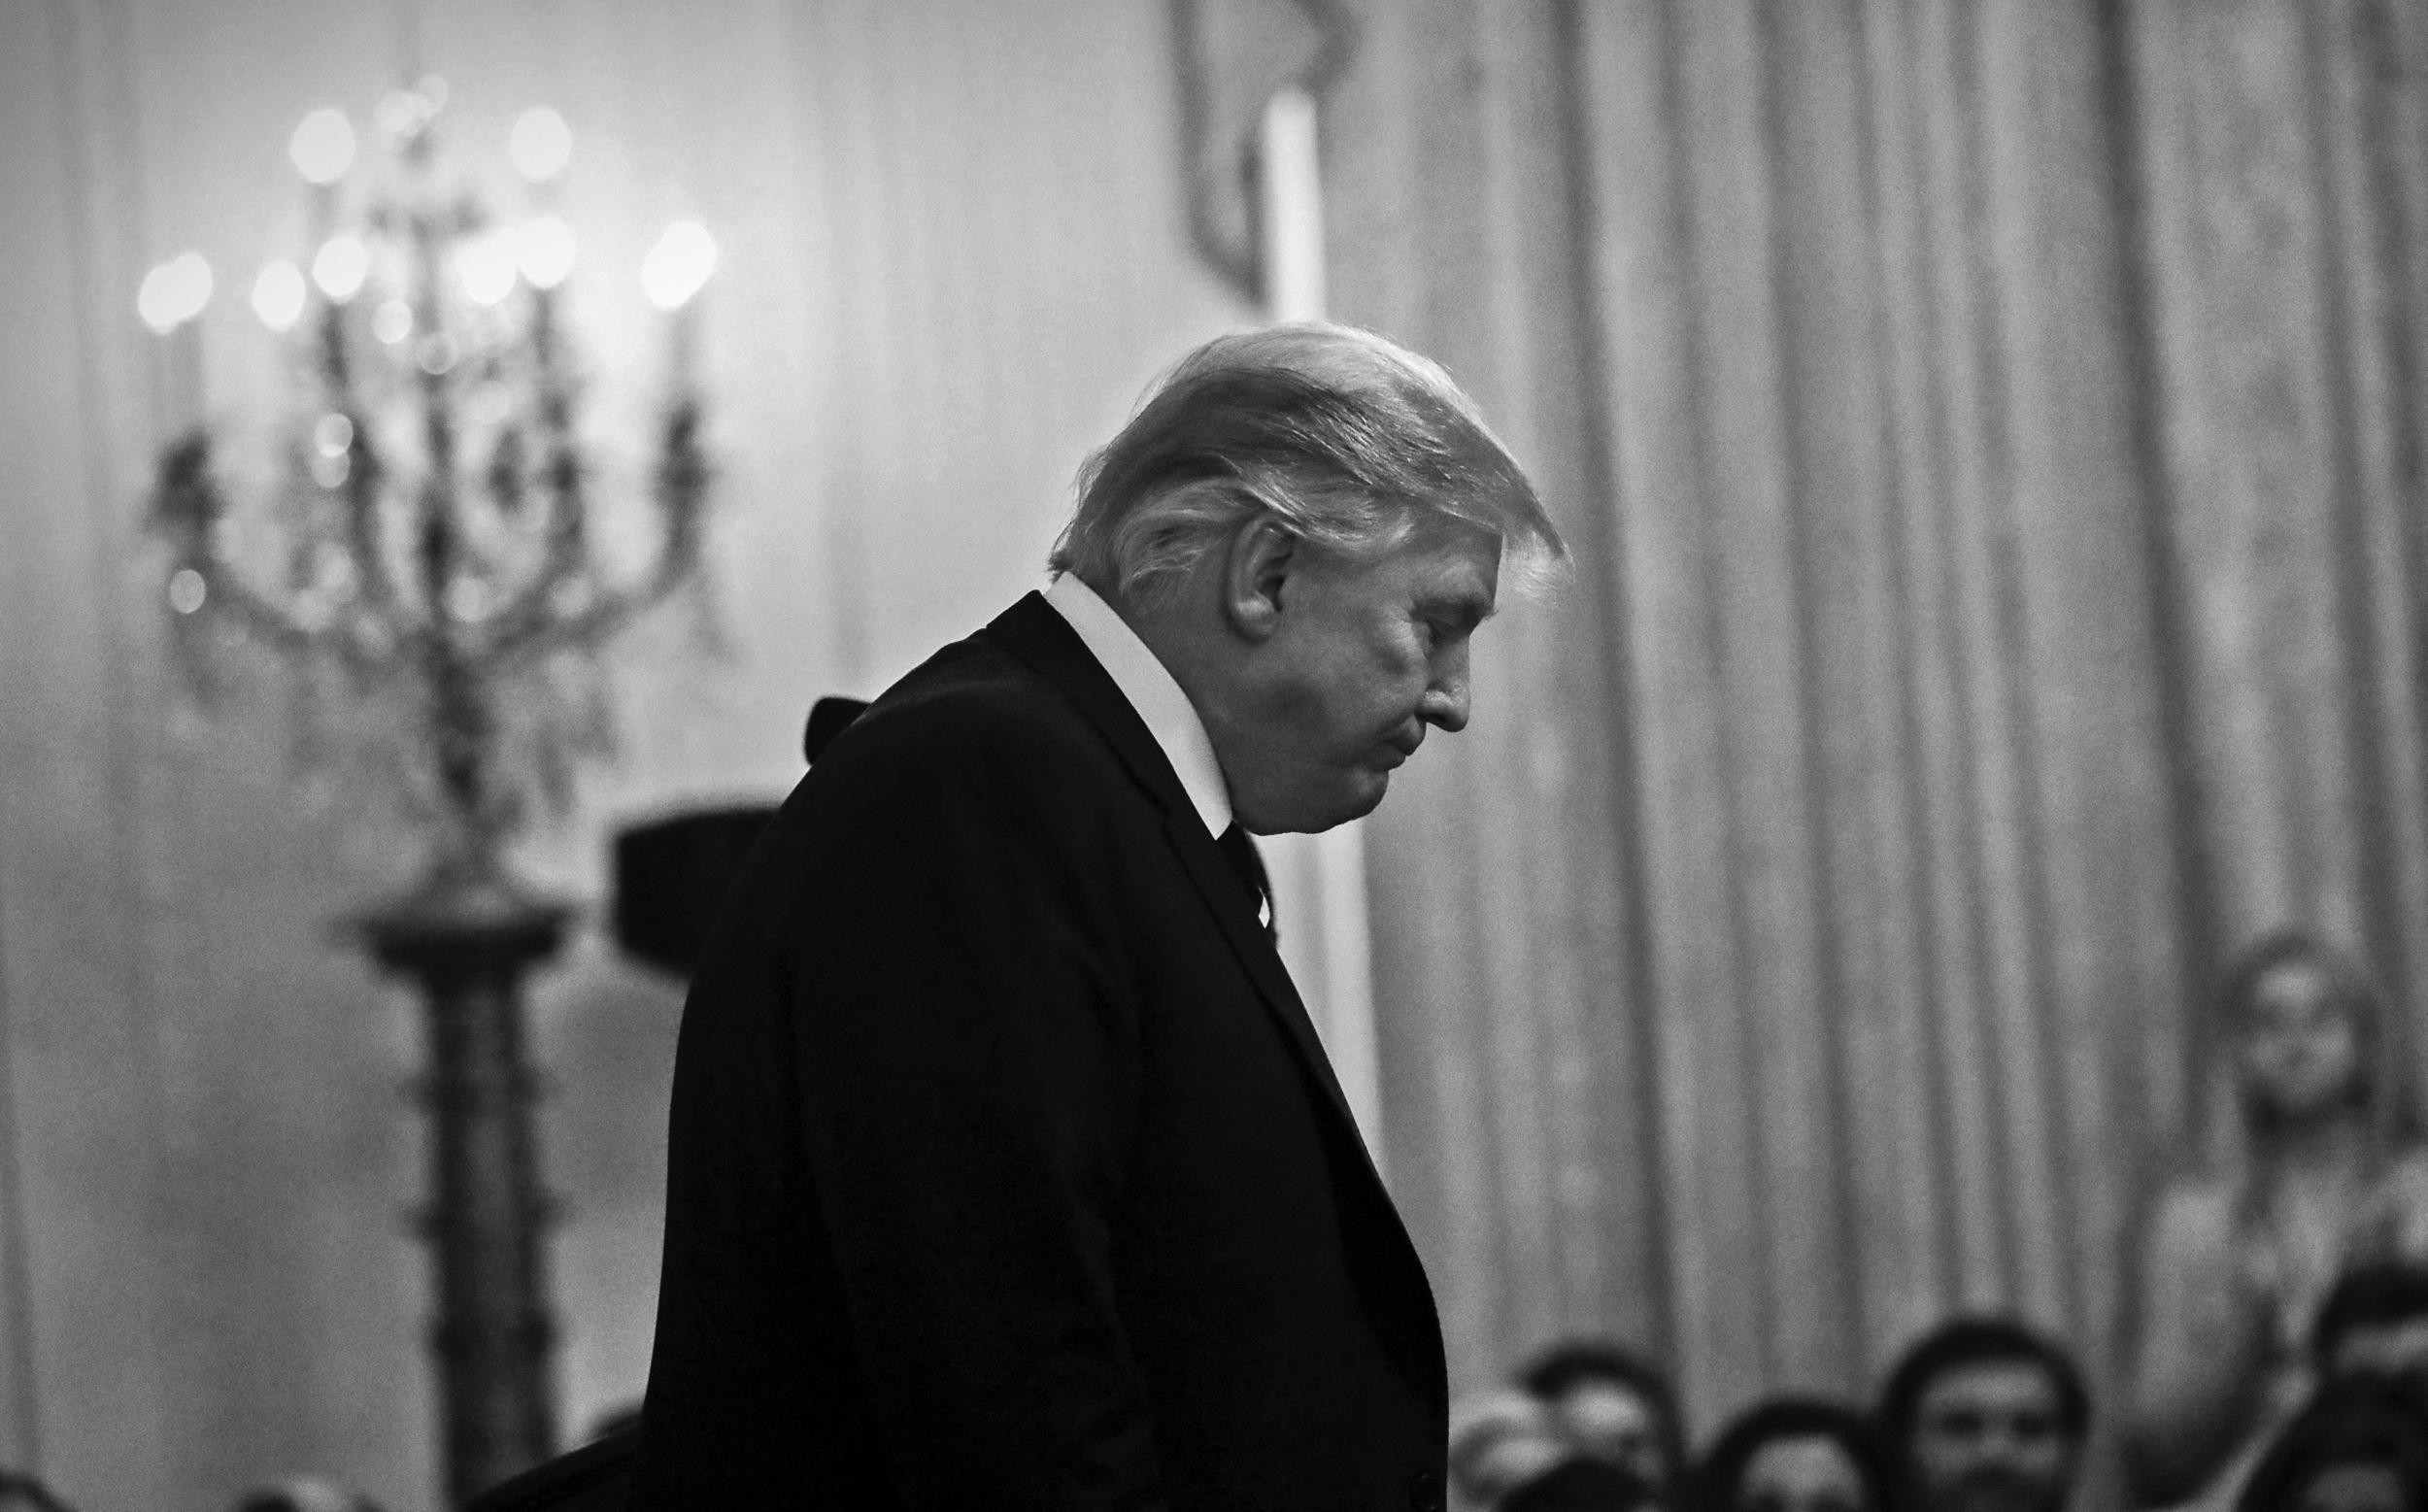 nbcnews.com - After infrastructure blowup, Trump owns Washington gridlock